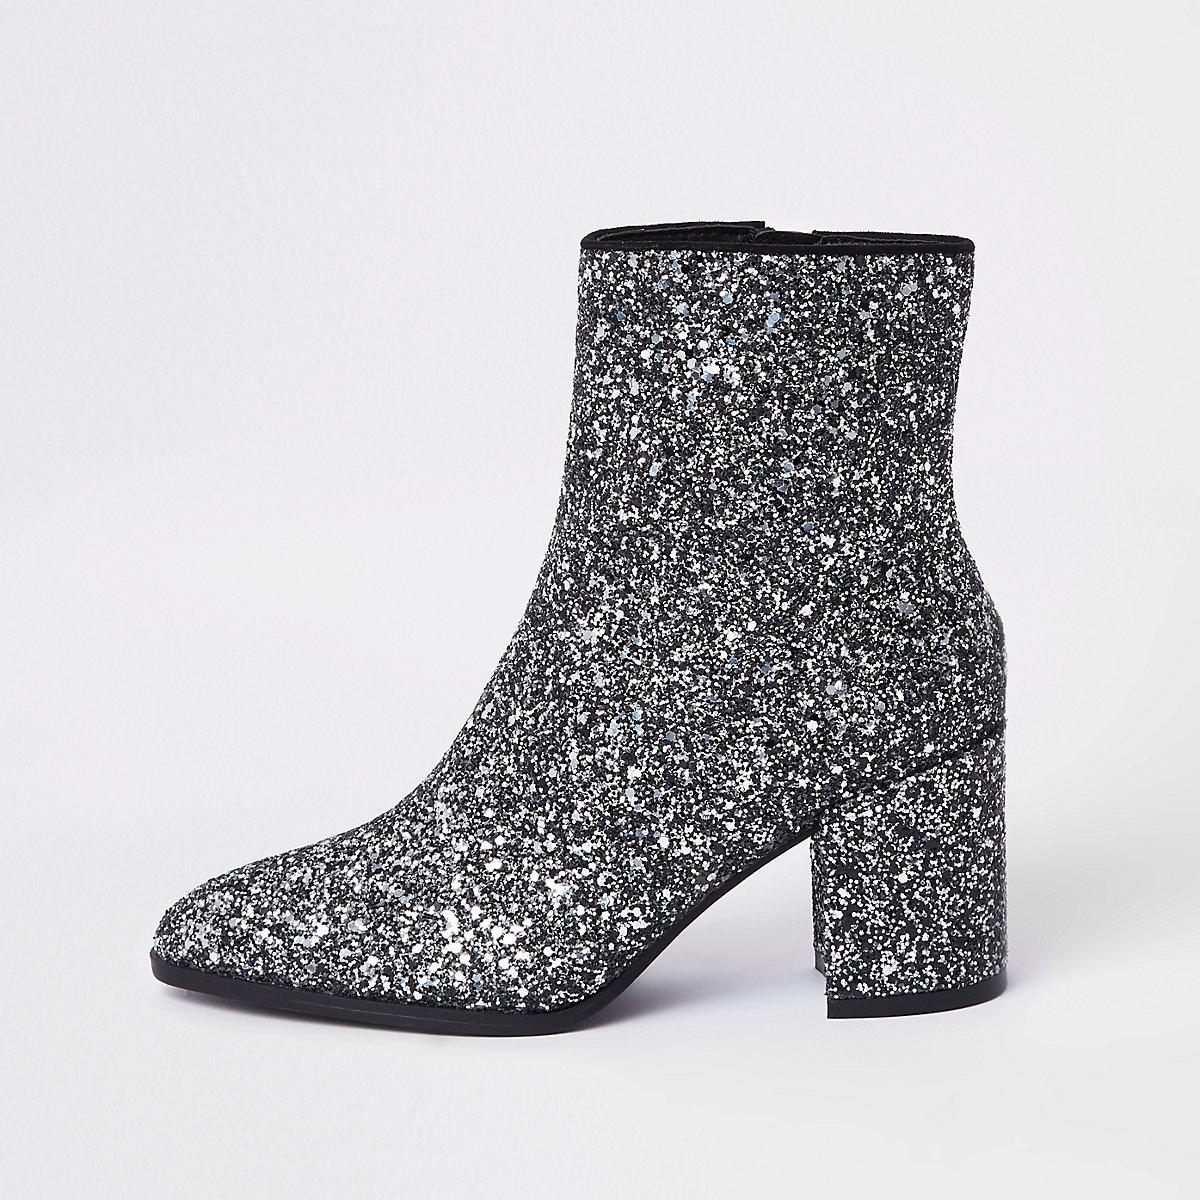 Silver glitter block heel ankle boots